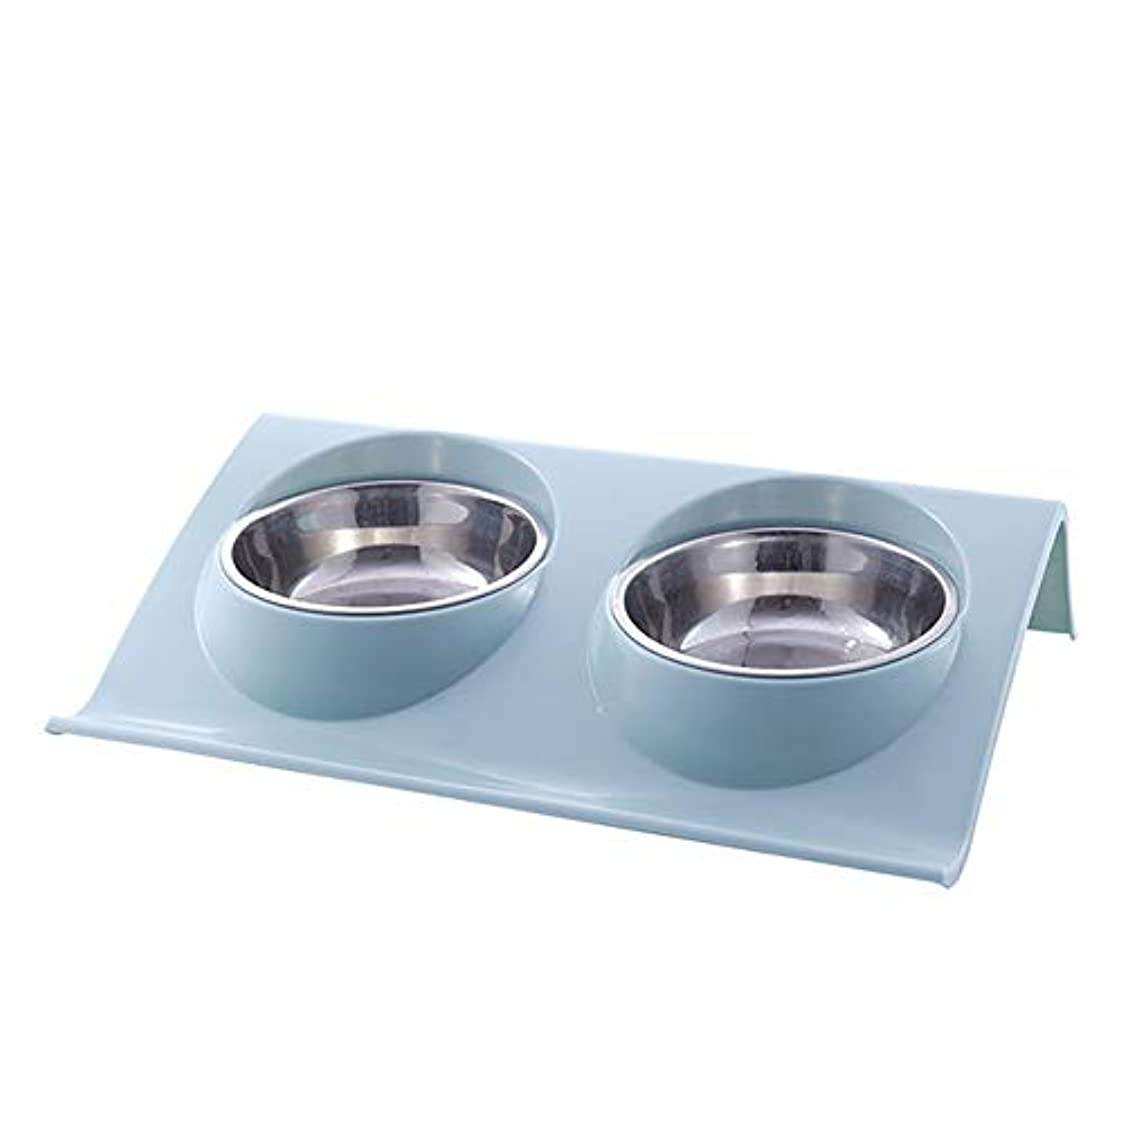 TINYPONY ペット食器 給食 給水 ダブルボウル 犬猫兼用 猫ボウル ペット 猫皿 食器スタンド 猫用食器 餌入れ 小中型犬用?猫用 食器ラック付き ステンレス